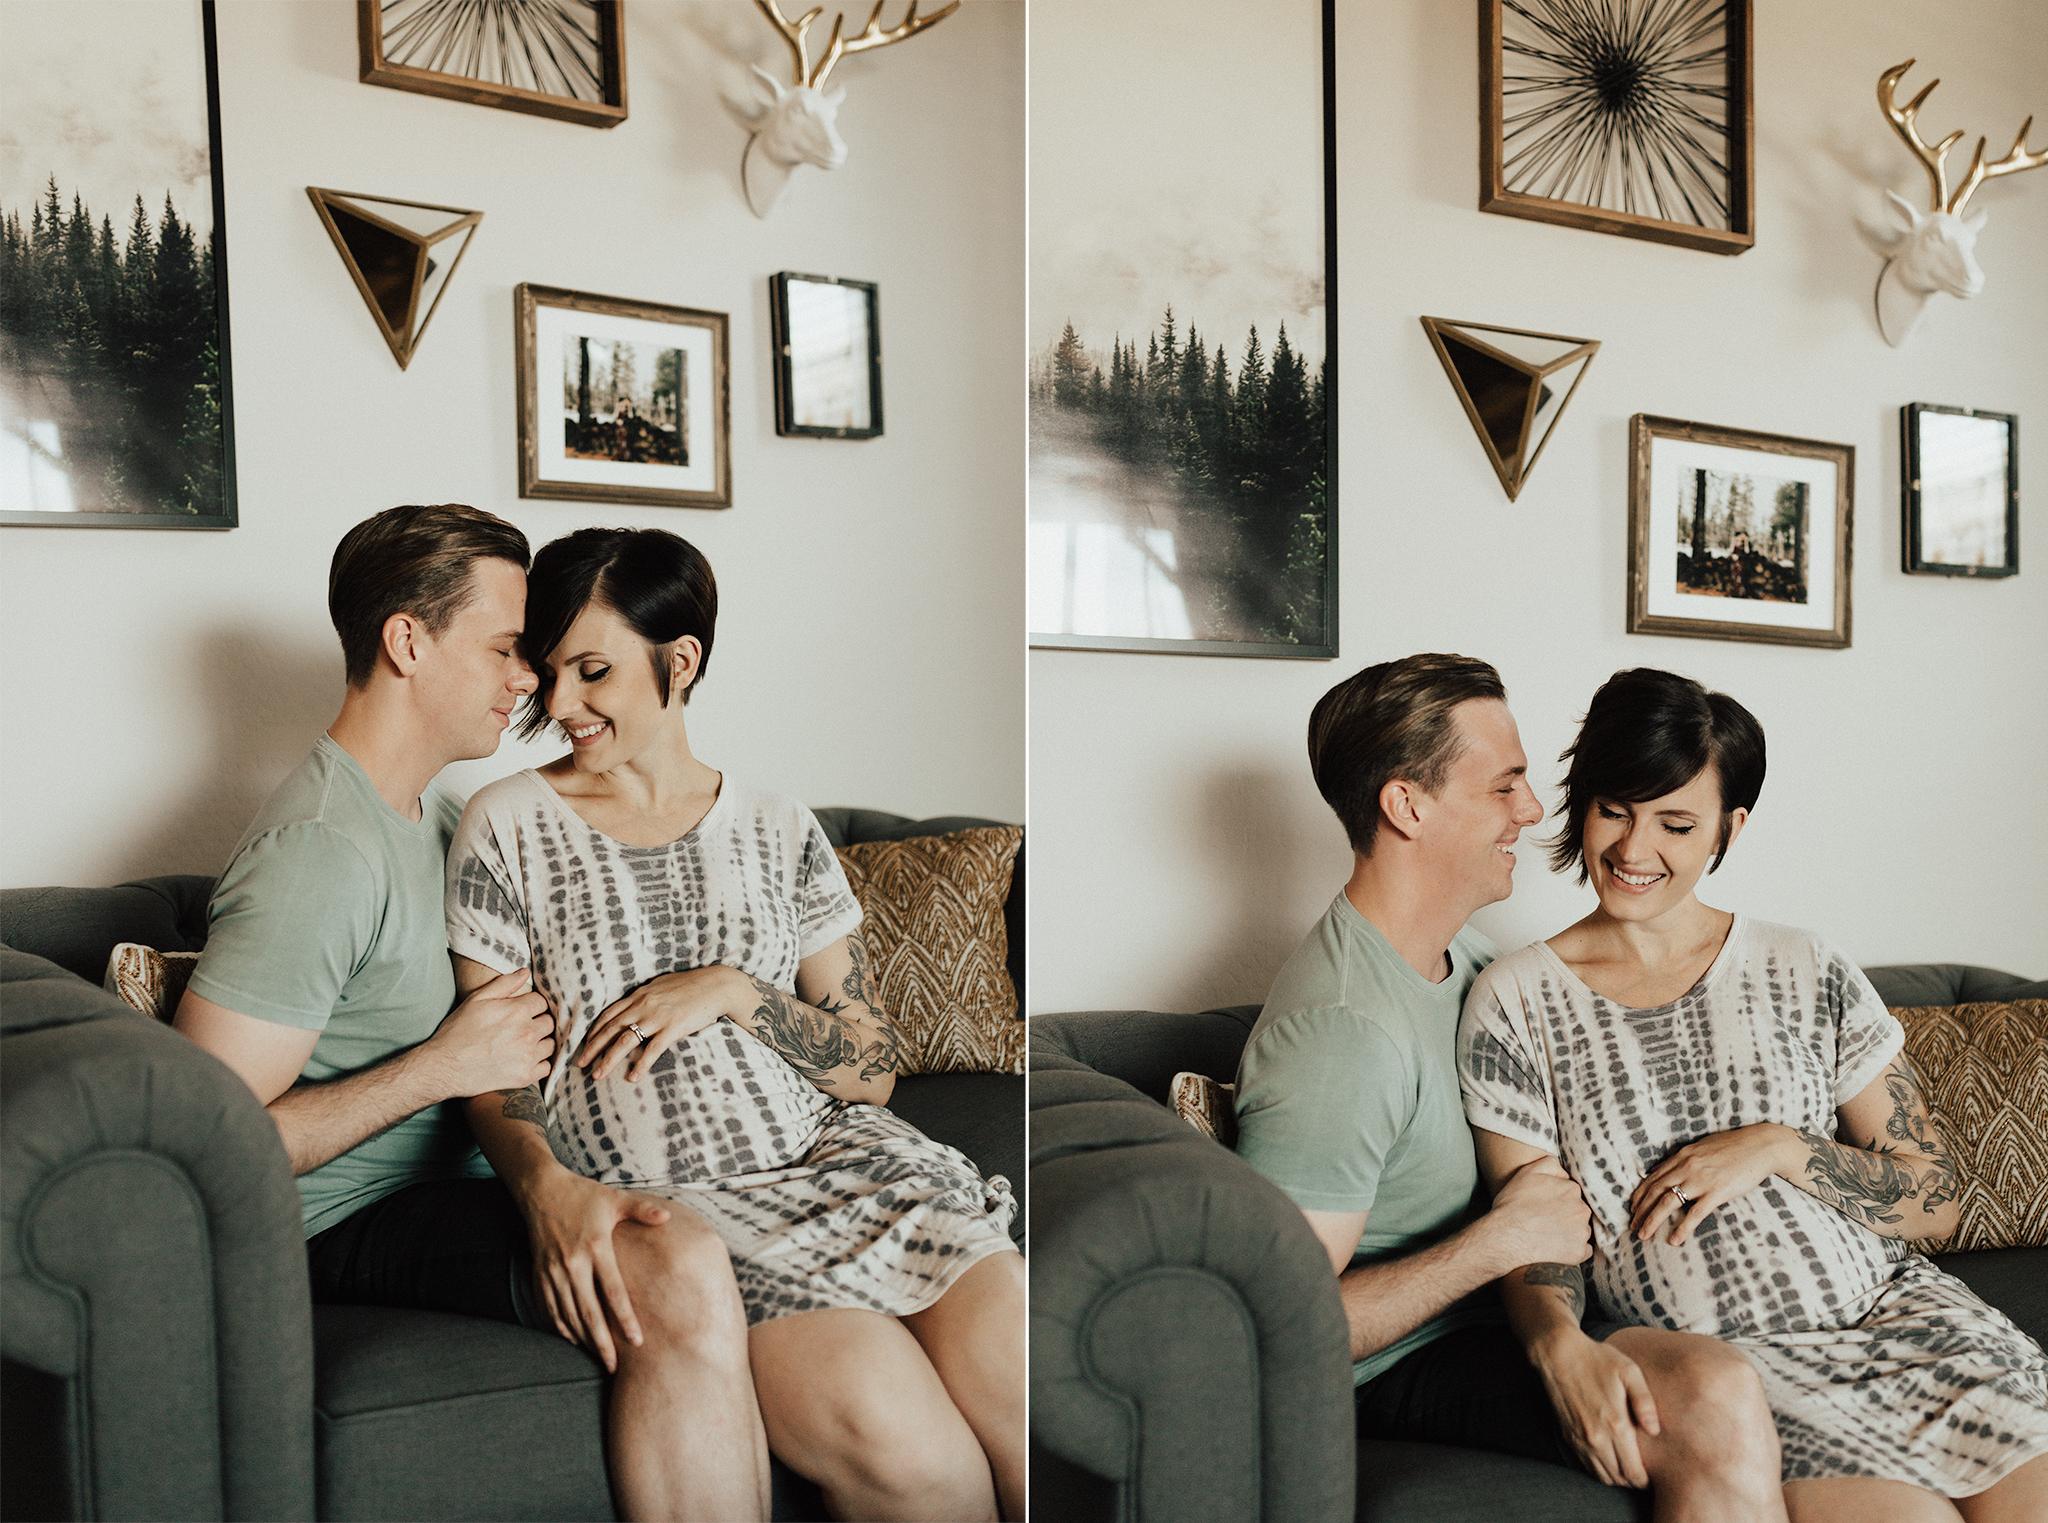 Arizona-Intimate-In-Home-Session-Maternity (2).jpg